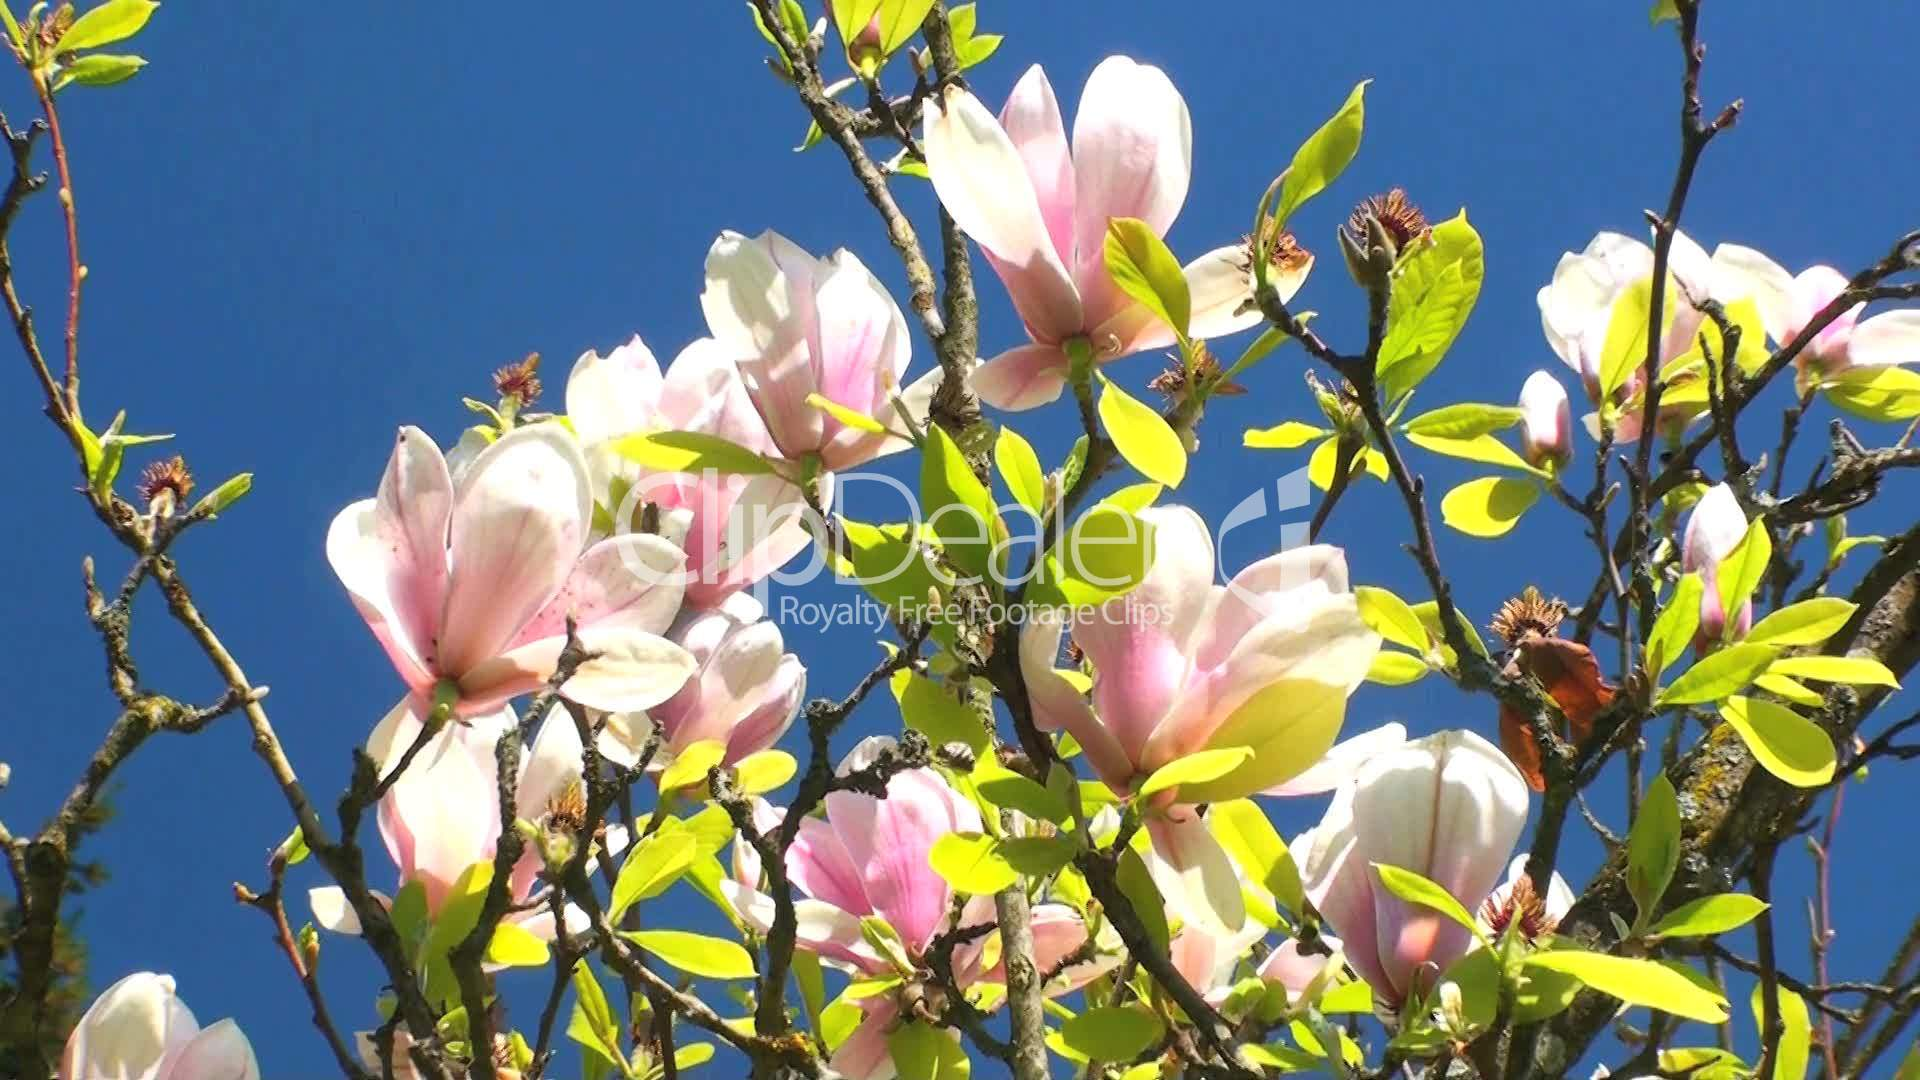 magnolienbaum lizenzfreie stock videos und clips. Black Bedroom Furniture Sets. Home Design Ideas